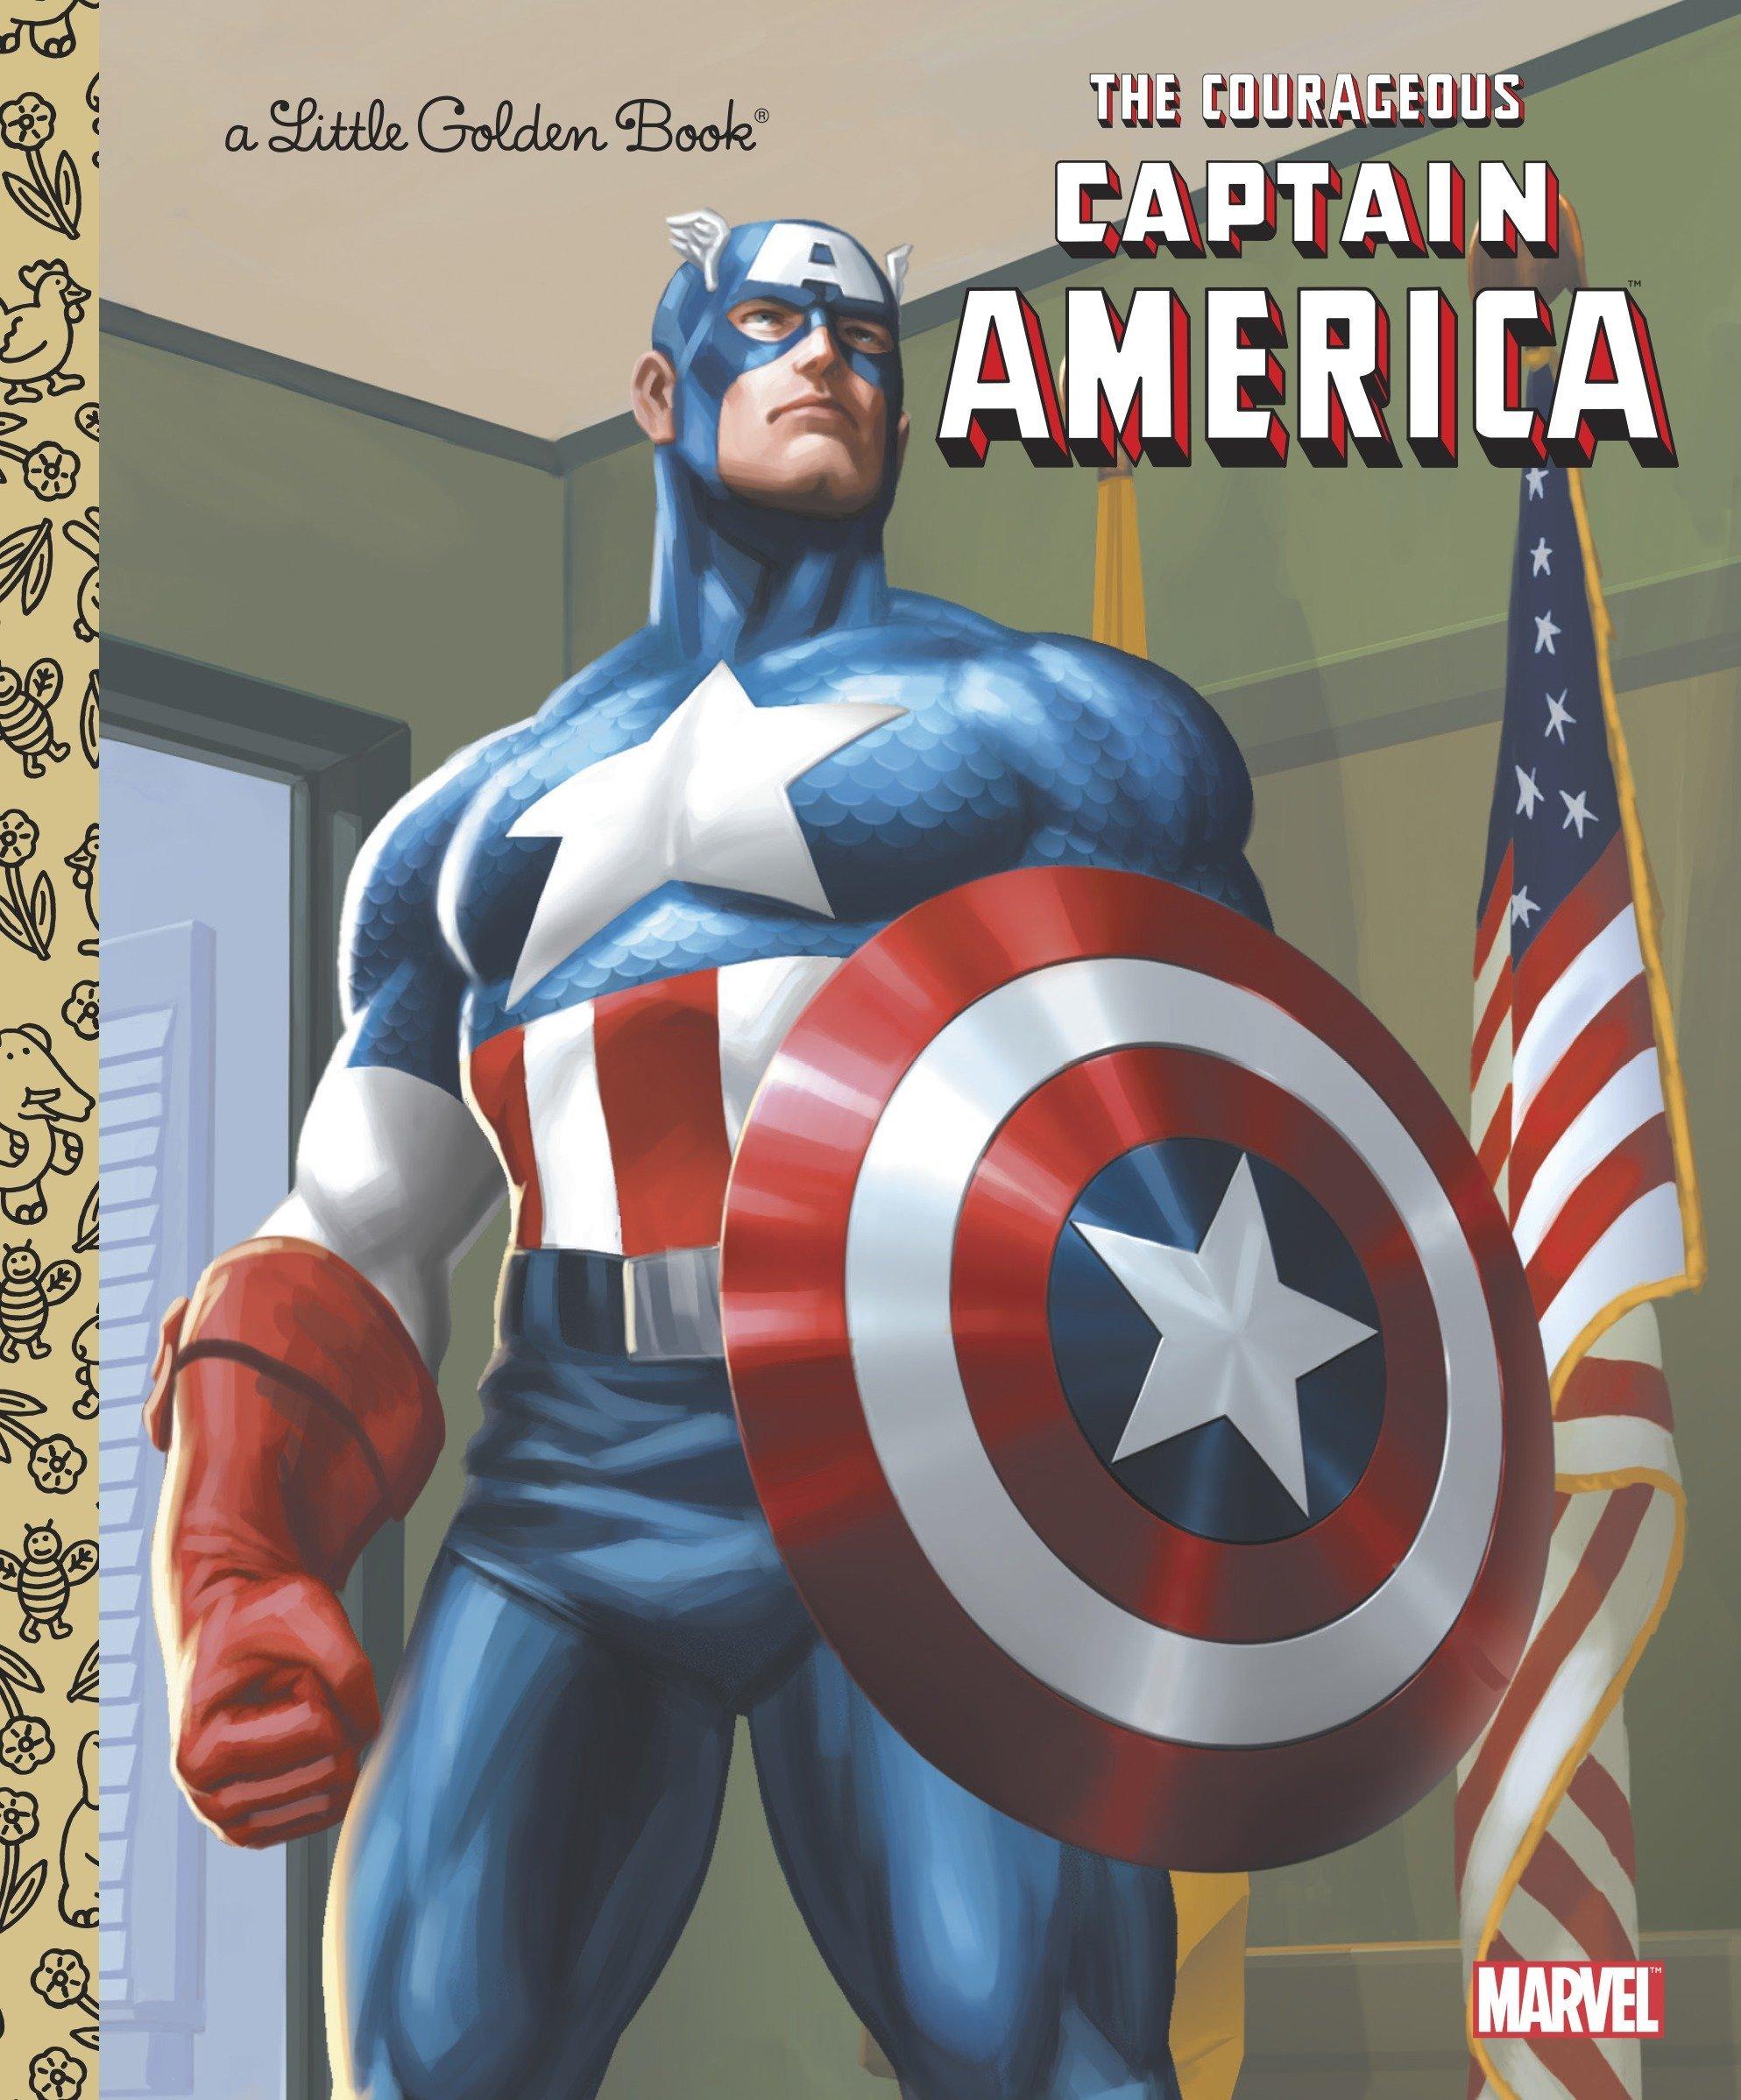 The Courageous Captain America (Marvel: Captain America) (Little Golden Book)